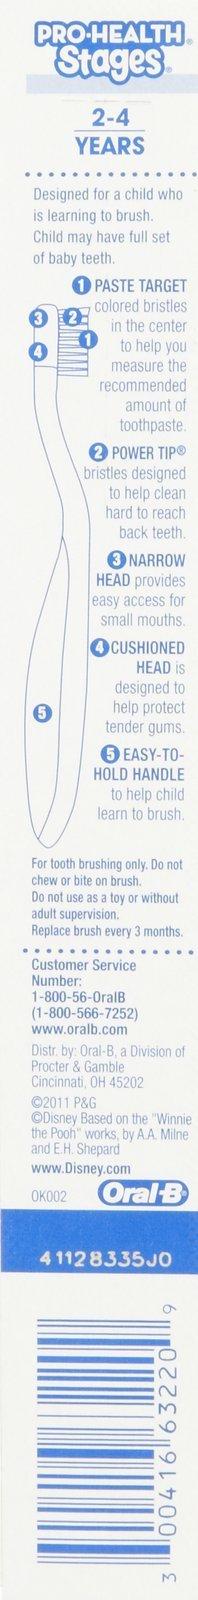 Oral B Stage 2 Toothbrush – Winne the Pooh – 6 pk